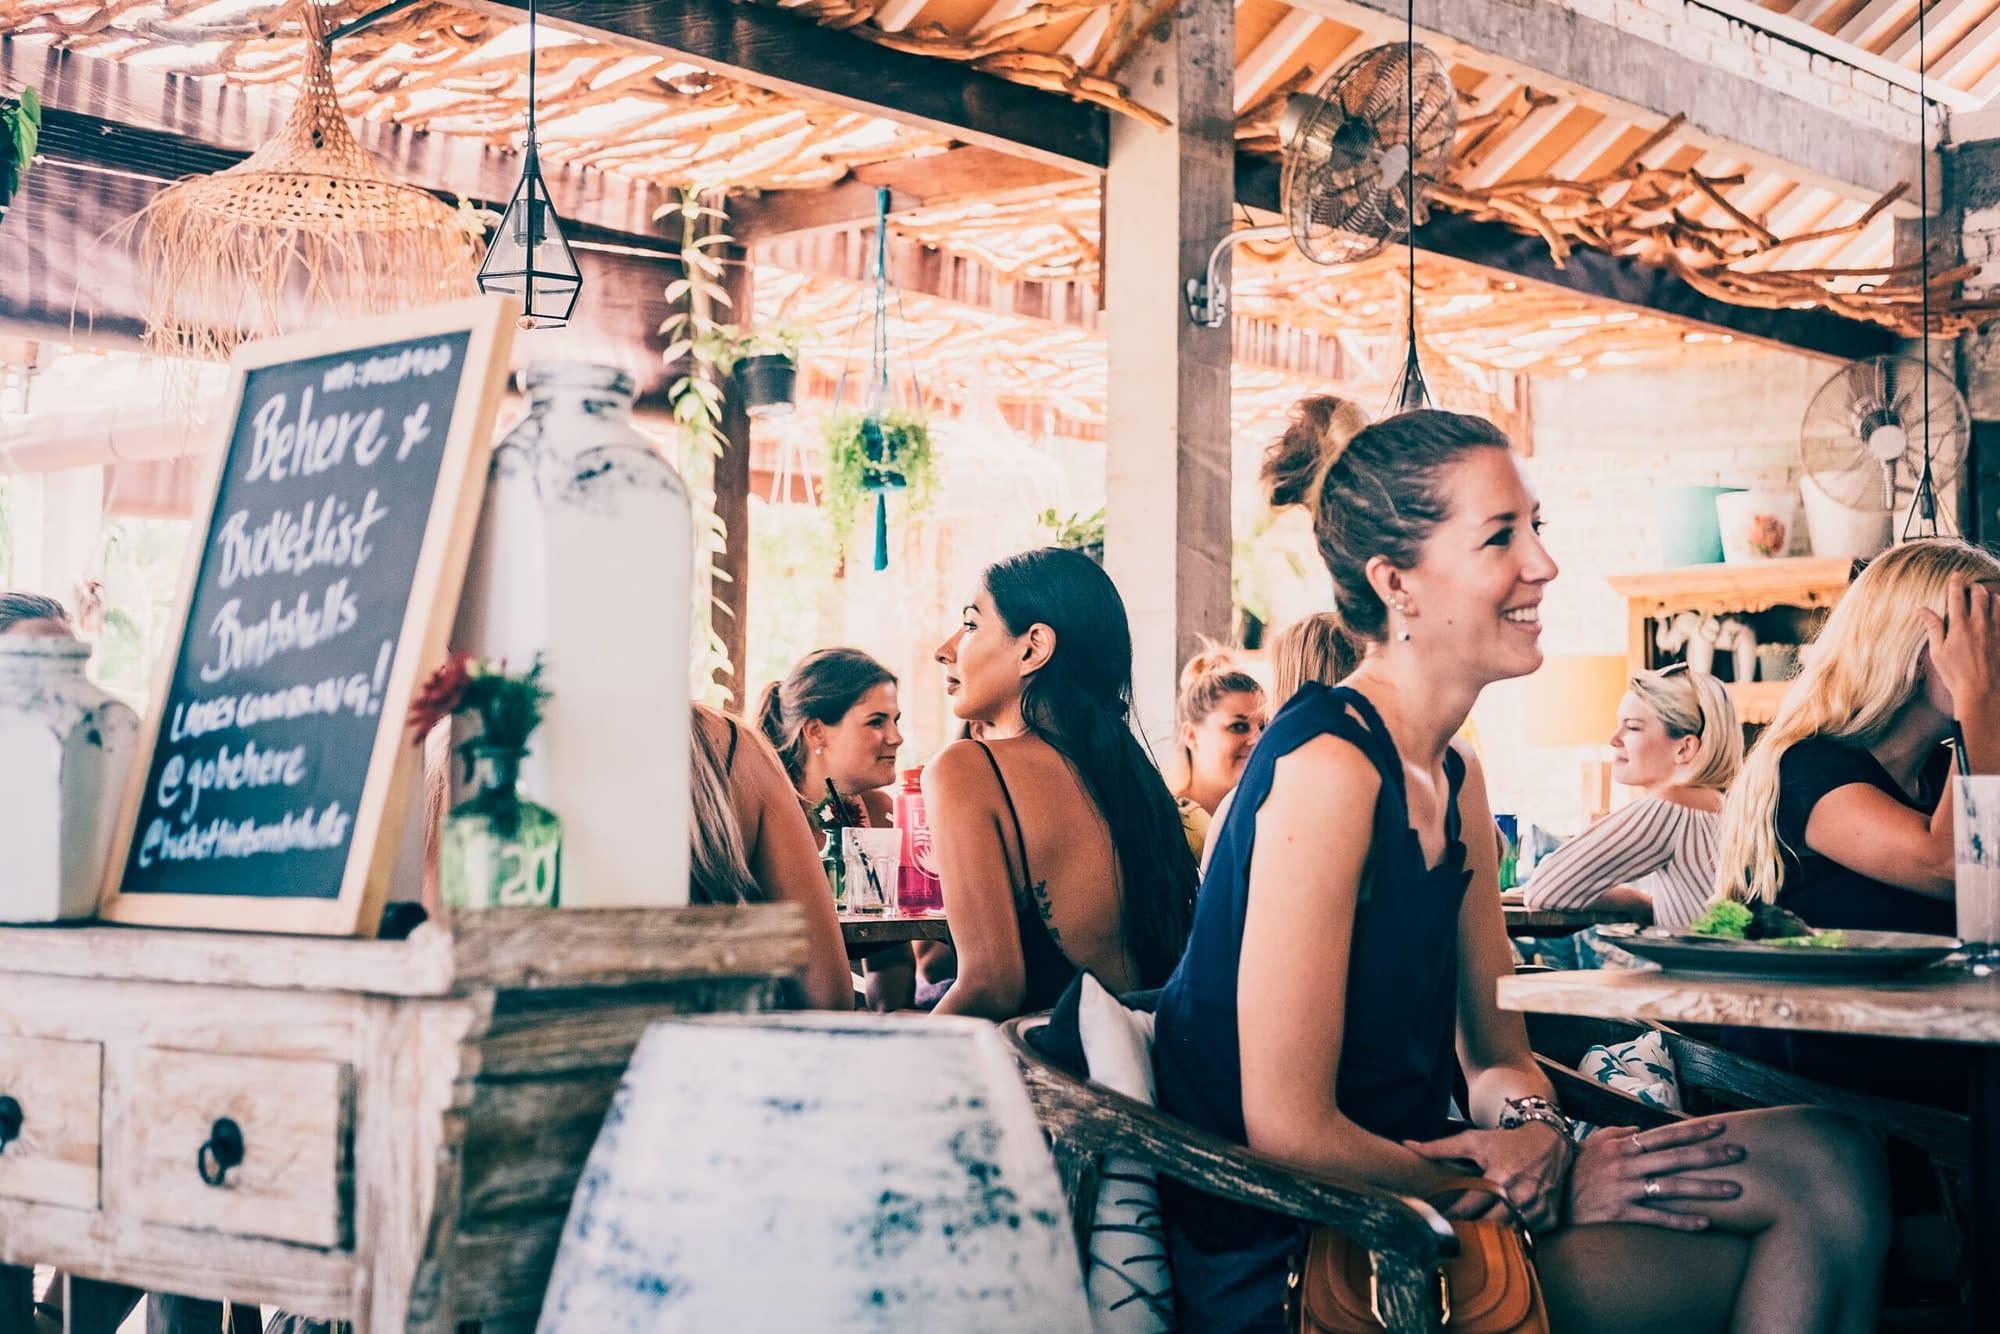 Women's Event | Coworking & Brunch in Beautiful Bali